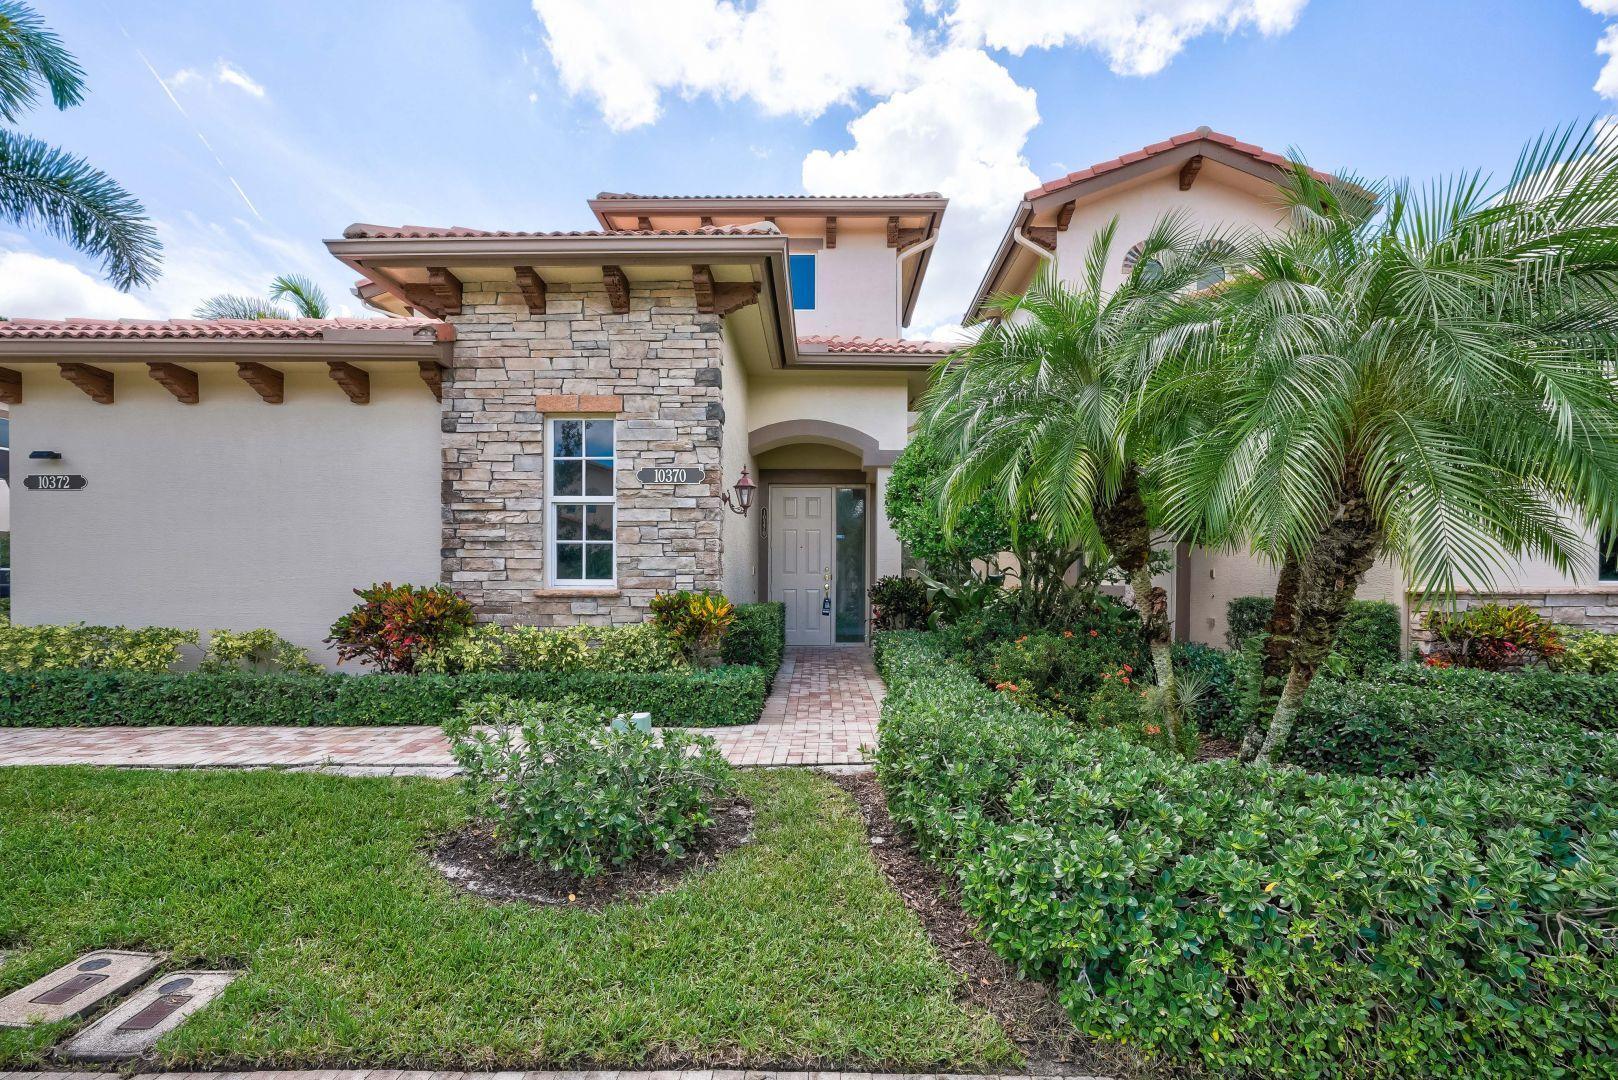 10370 Orchid Reserve Drive 12c, West Palm Beach, Florida 33412, 3 Bedrooms Bedrooms, ,3.1 BathroomsBathrooms,A,Condominium,Orchid Reserve,RX-10464925